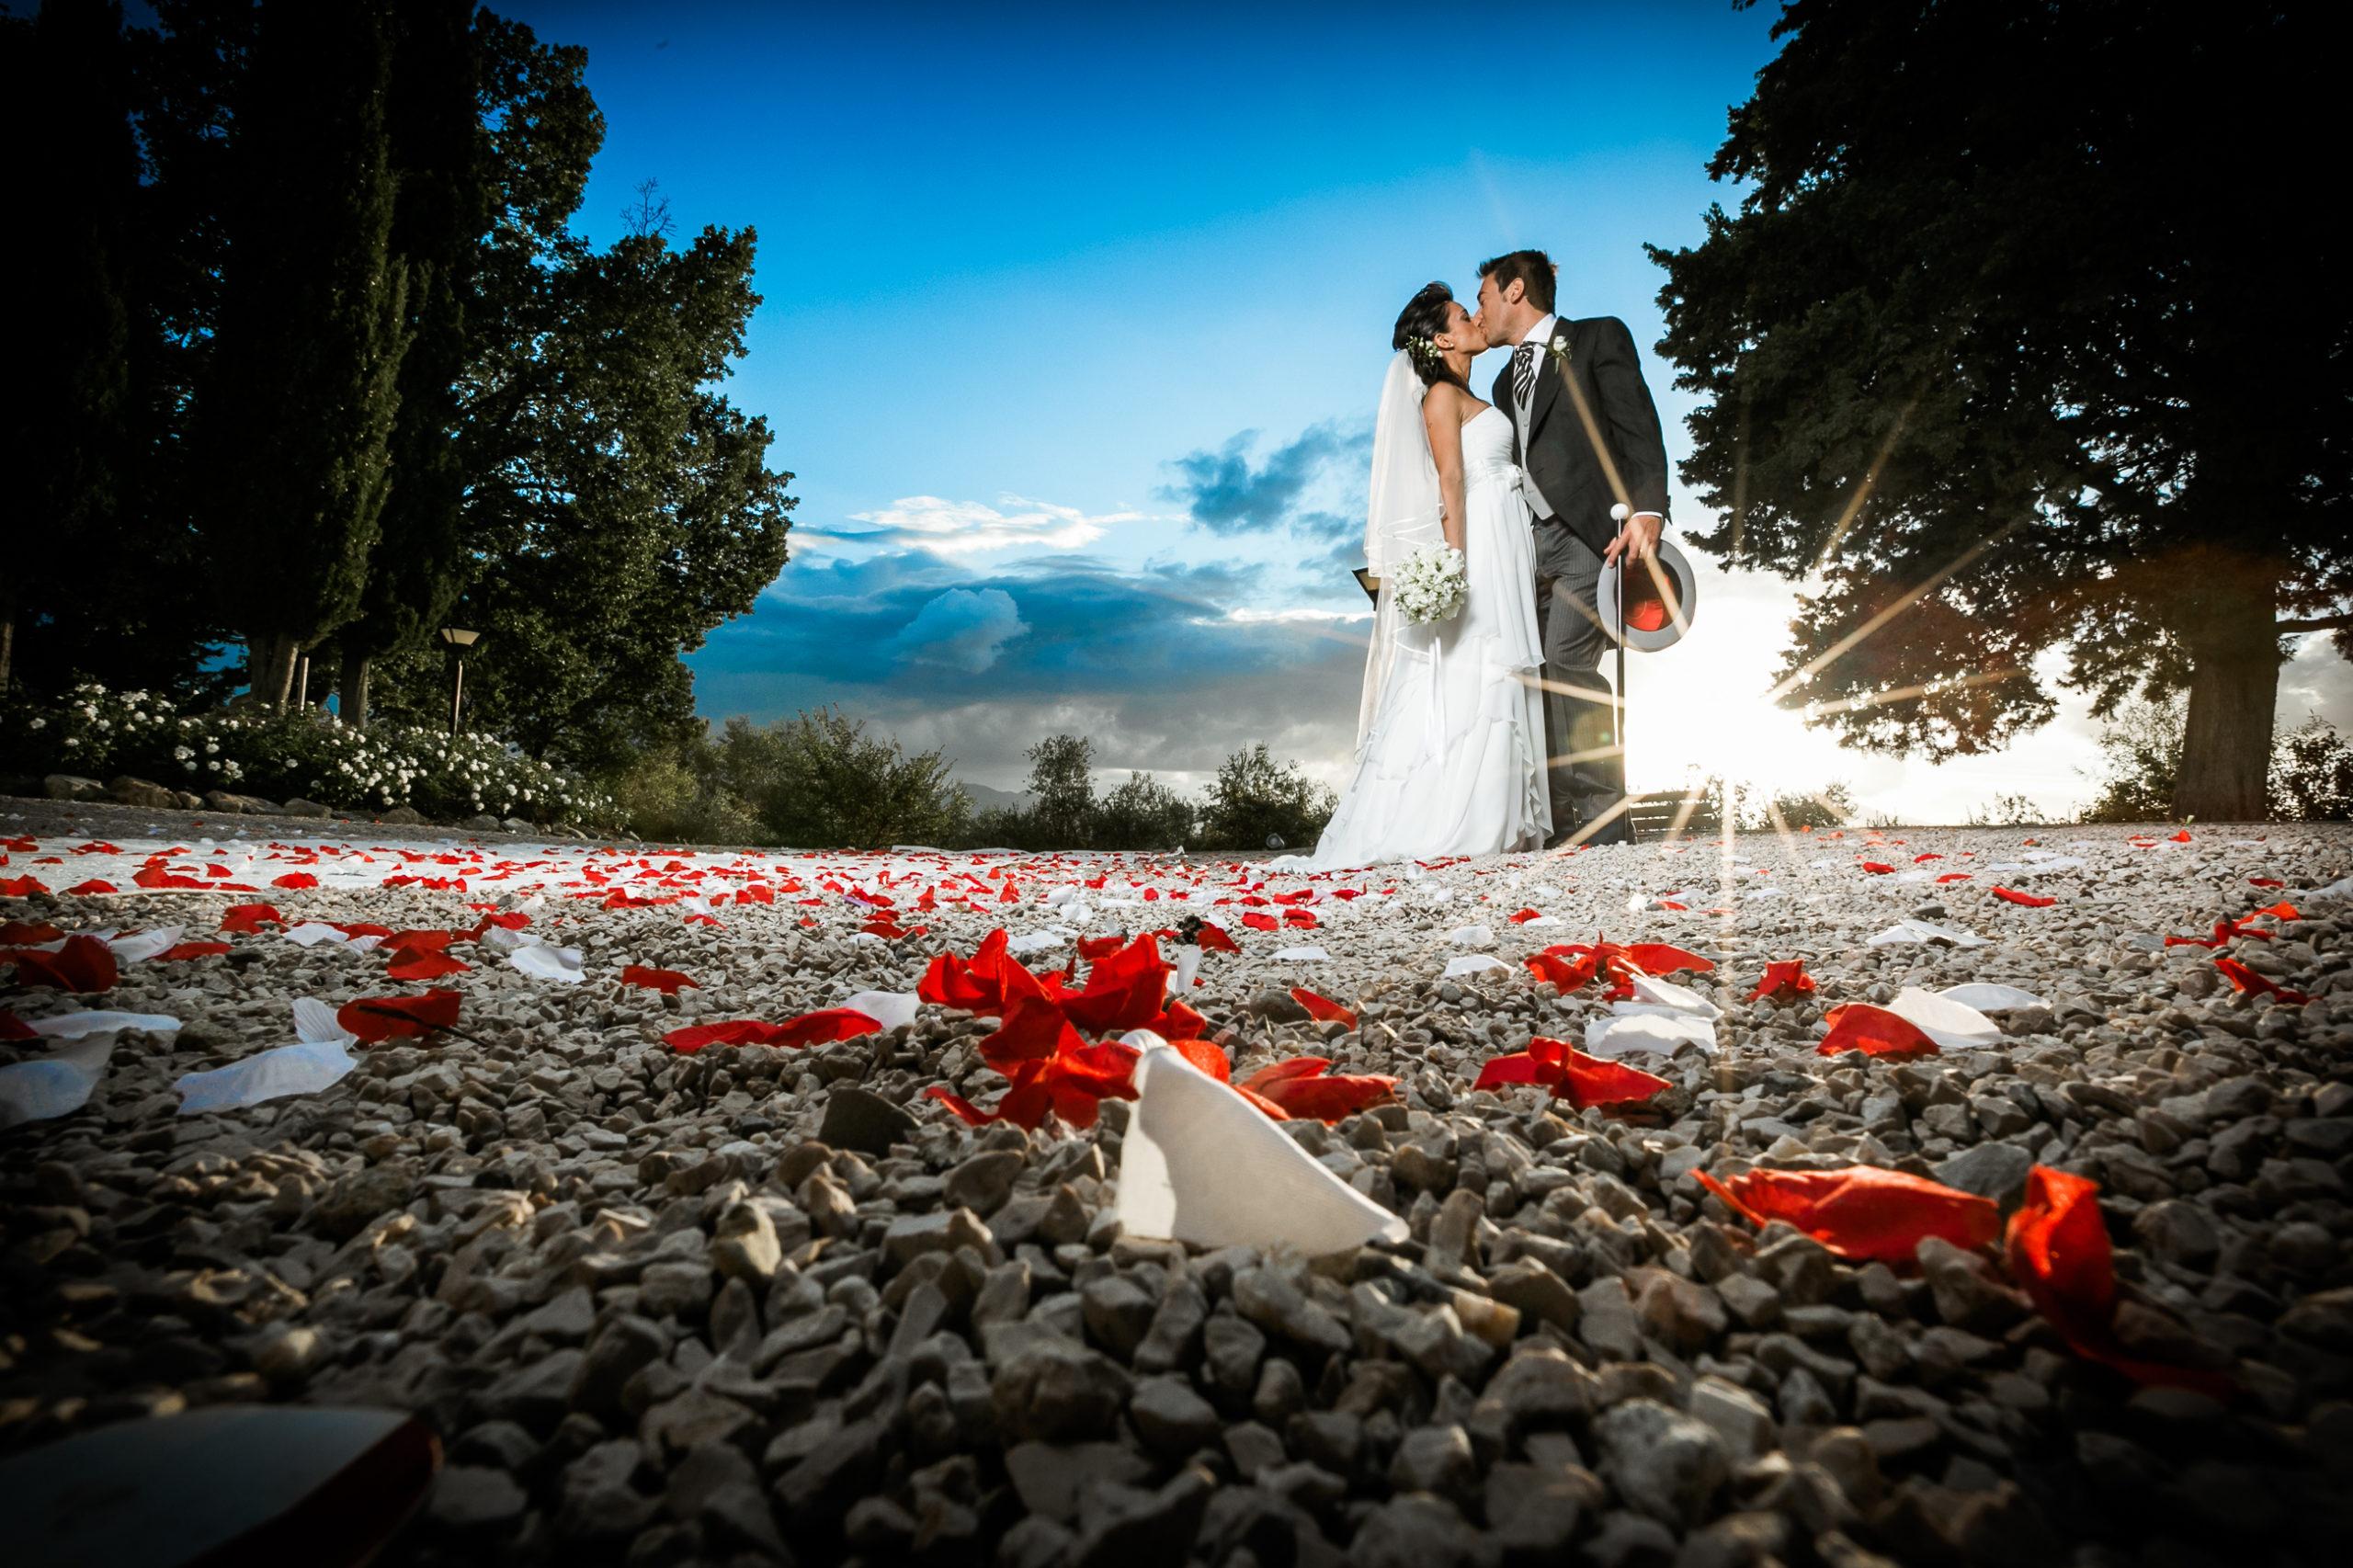 wedding-fonte-verde-san-casciano-dei-bagni-toscana-siena-foto-forti-gabriele